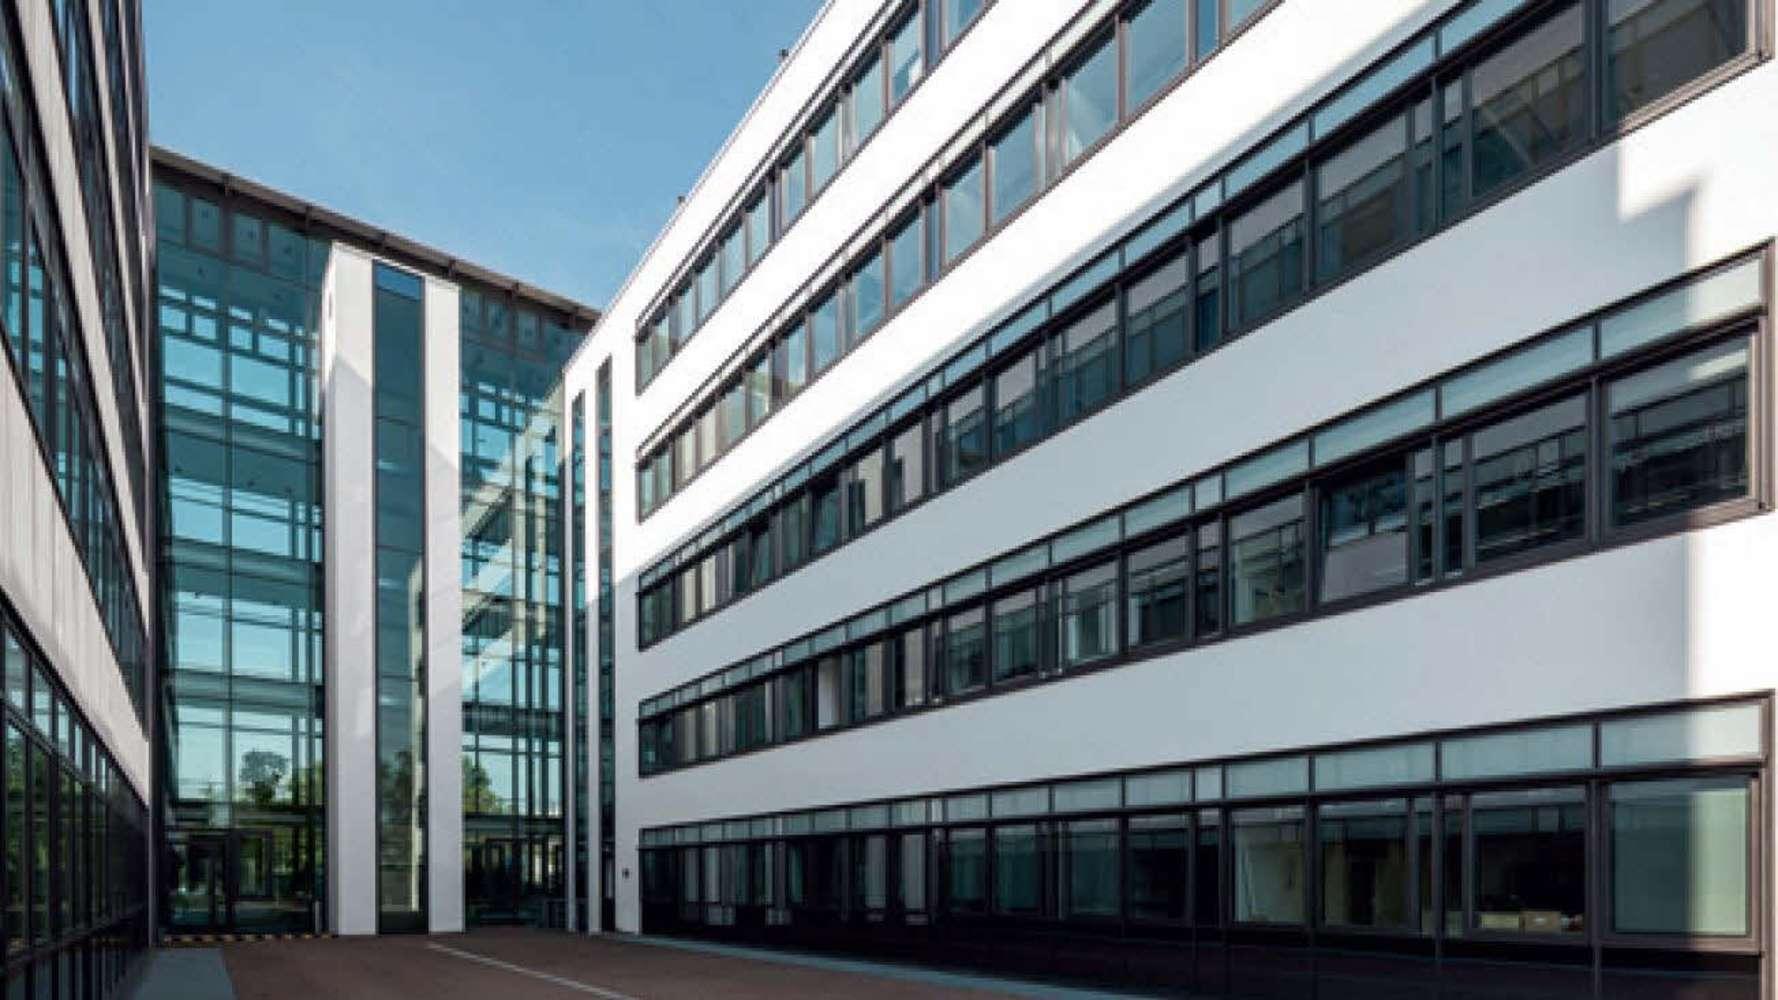 Büros Frankfurt am main, 65926 - Büro - Frankfurt am Main, Höchst - F2035 - 9412519